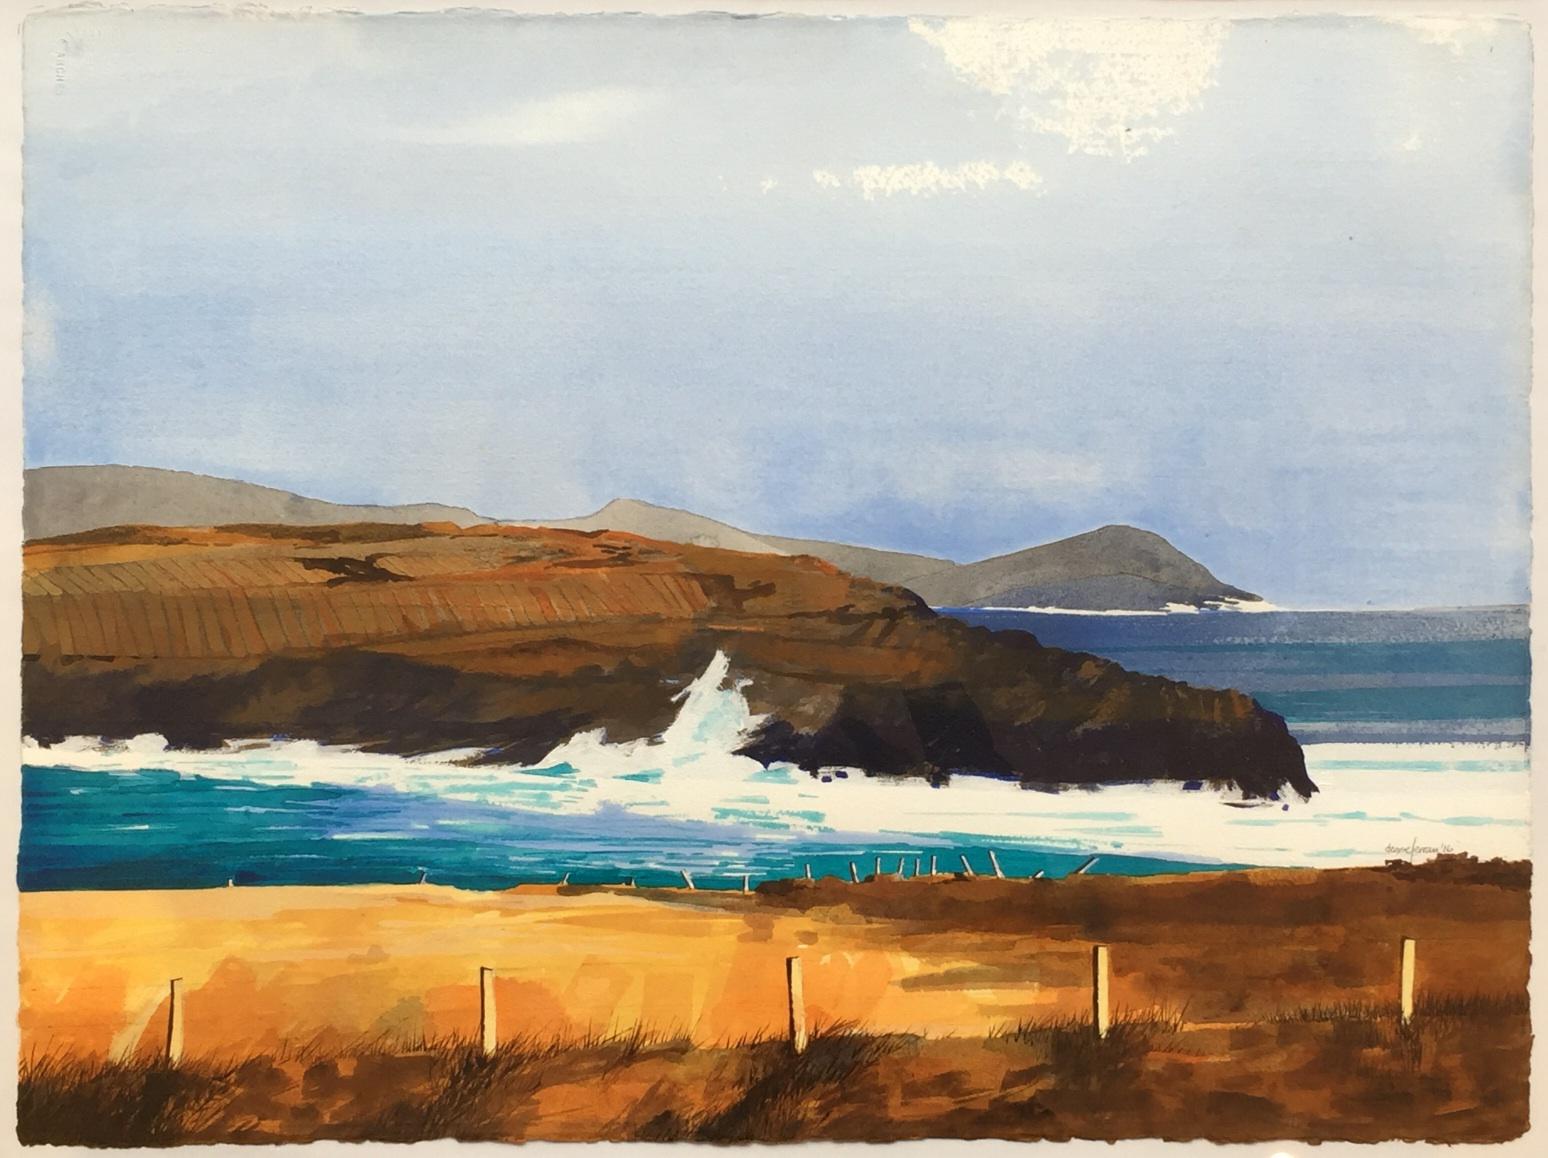 Denise Ferran PRUA, Ballinskelligs Bay, acrylic on watercolour paper, 57 x 76 cm